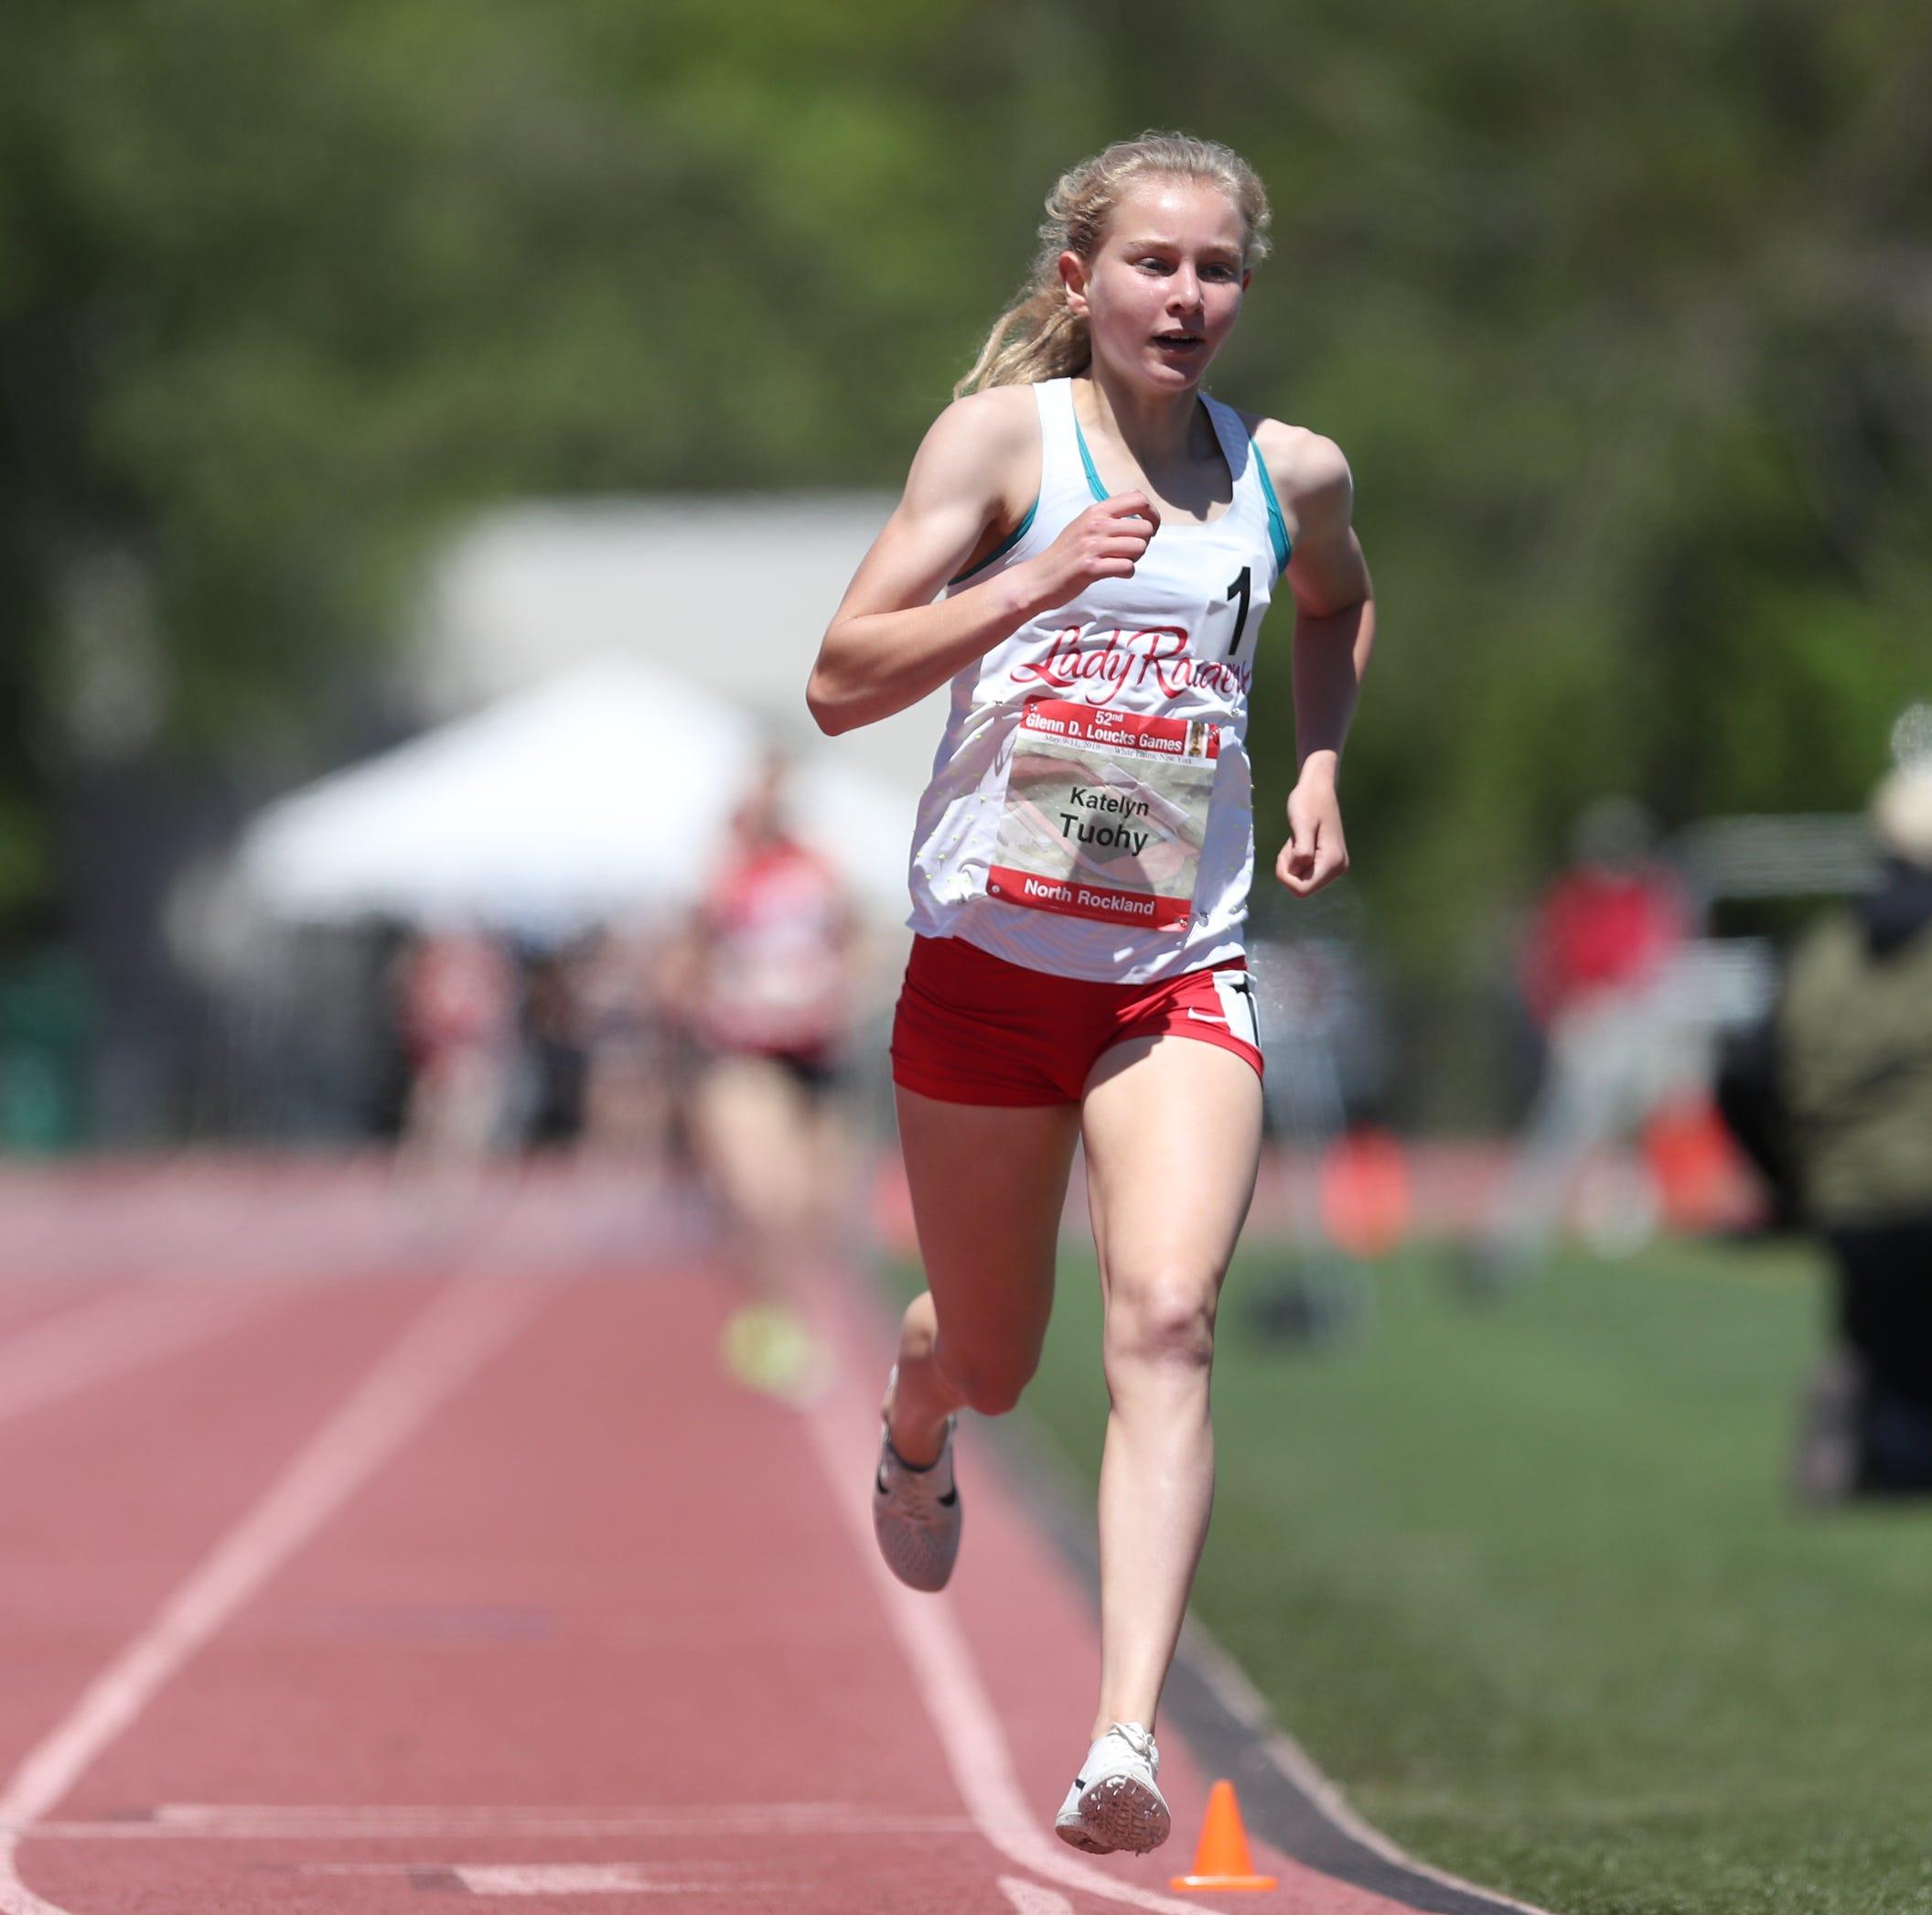 Track & field: Katelyn Tuohy, Matt Rizzo win Loucks miles; Bronxville wins boys relay